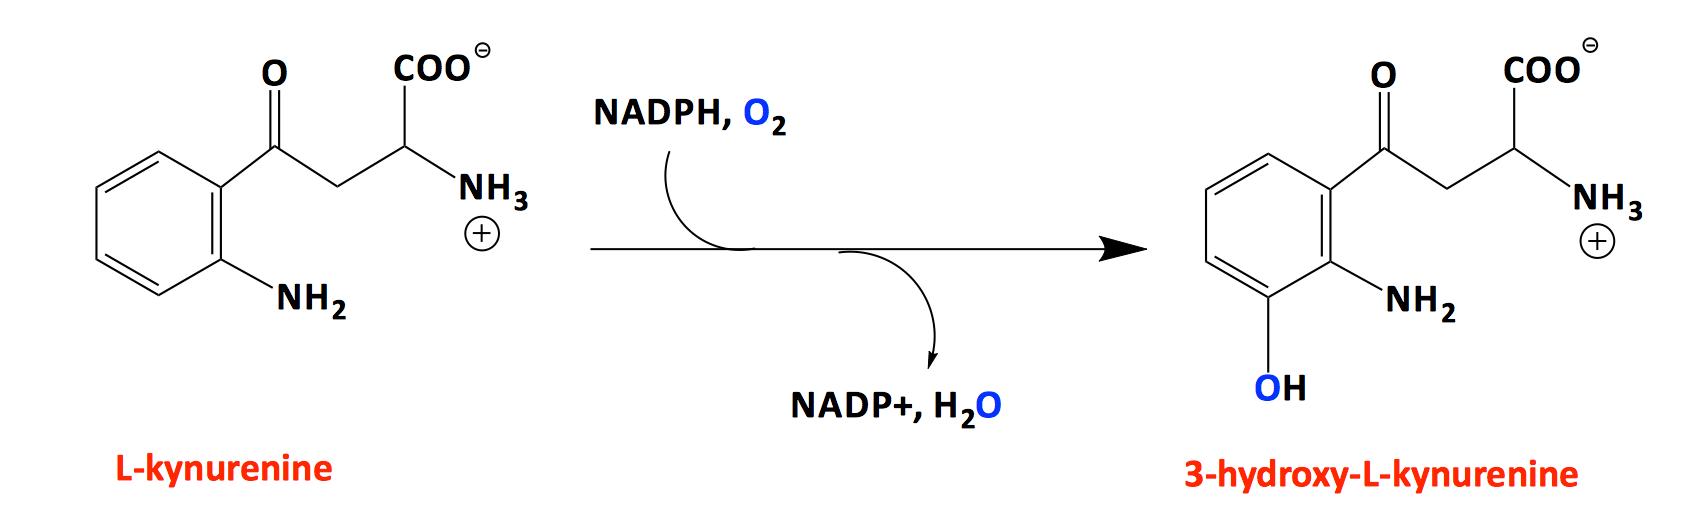 https://uwm.edu/chemistry/wp-content/uploads/sites/194/2015/03/Graham-Moran-Profile-Image-2.png